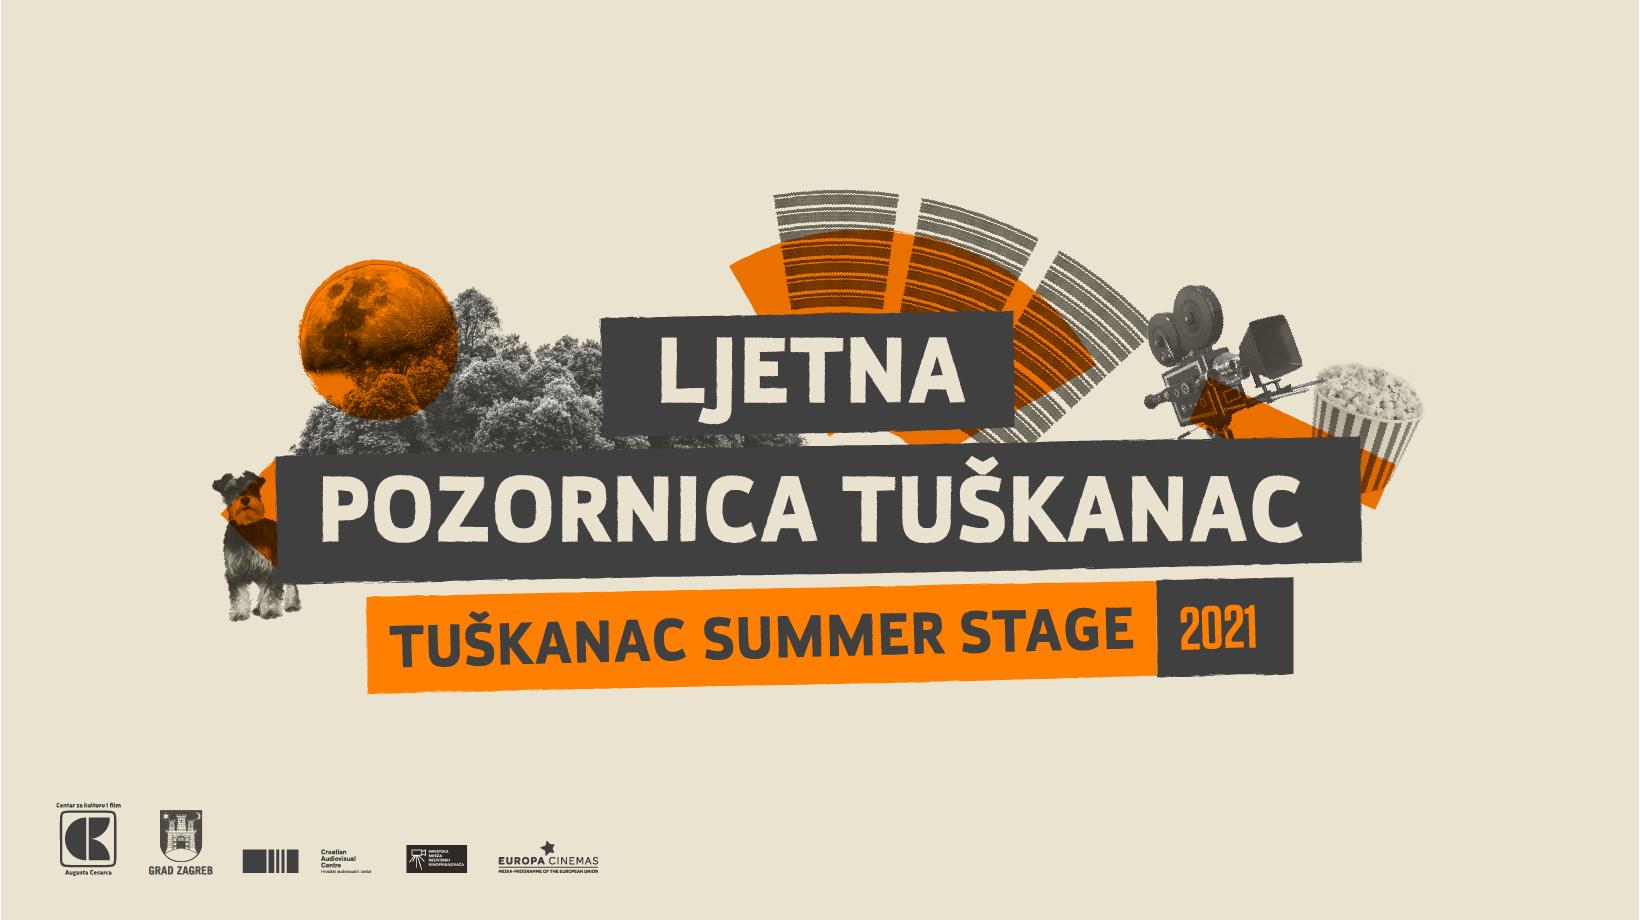 Prva polovica srpnja na Ljetnoj pozornici Tuškanac rezervirana je za izvrsne filmske naslove